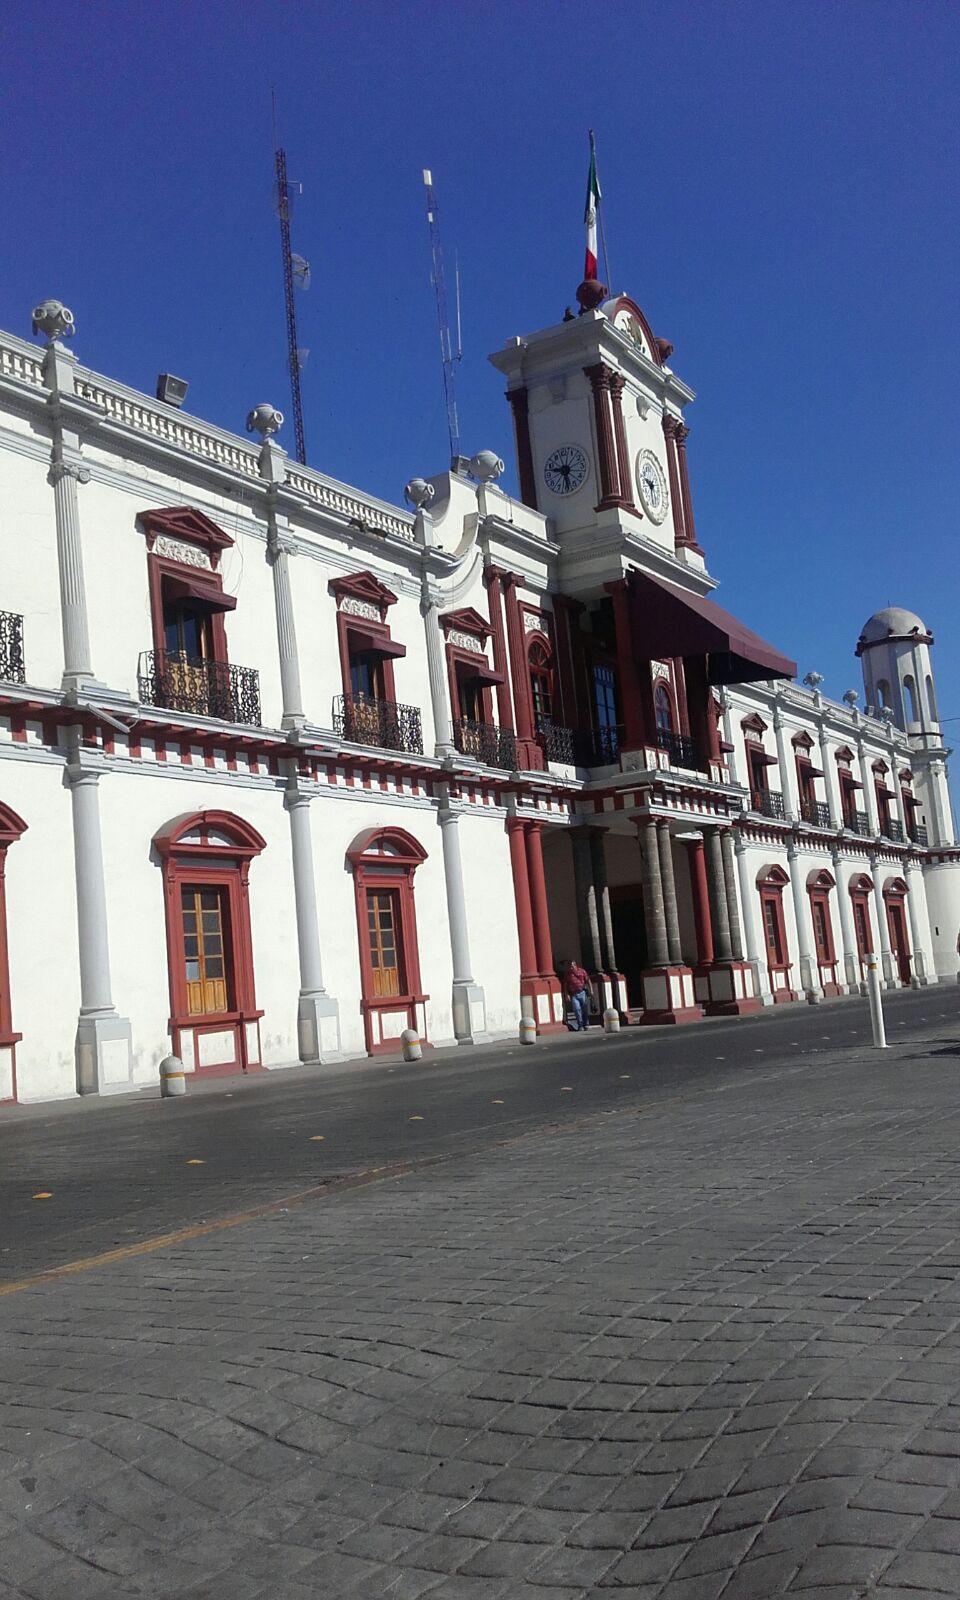 File:Palacio de Gobierno en Tepic, Nayarit.jpg - Wikimedia Commons